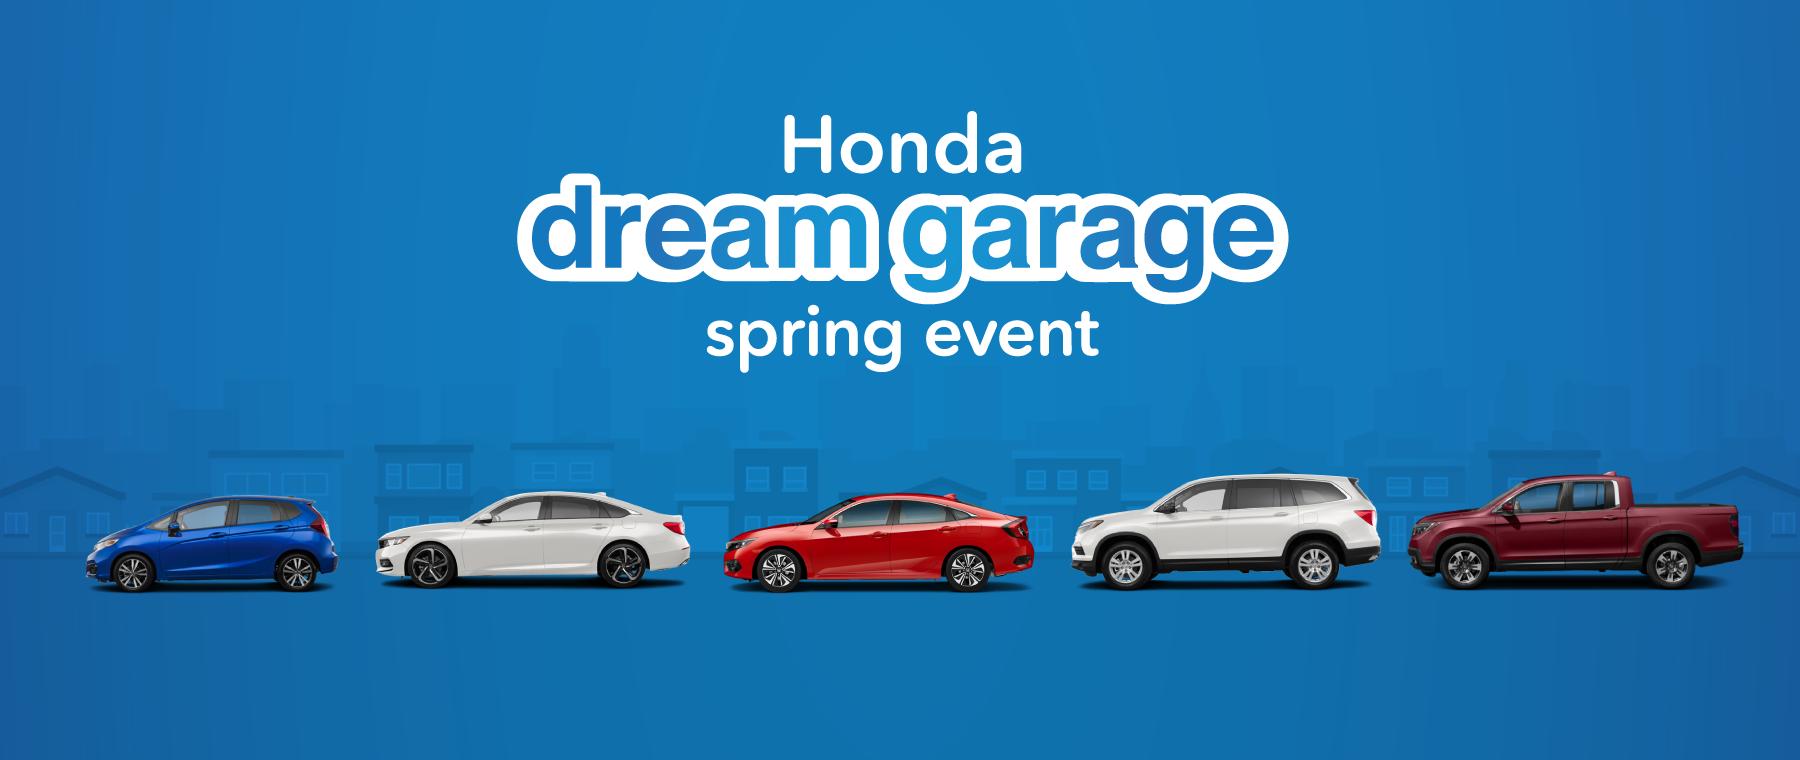 Honda dealership in chicago new used car dealership for Honda dealers chicago